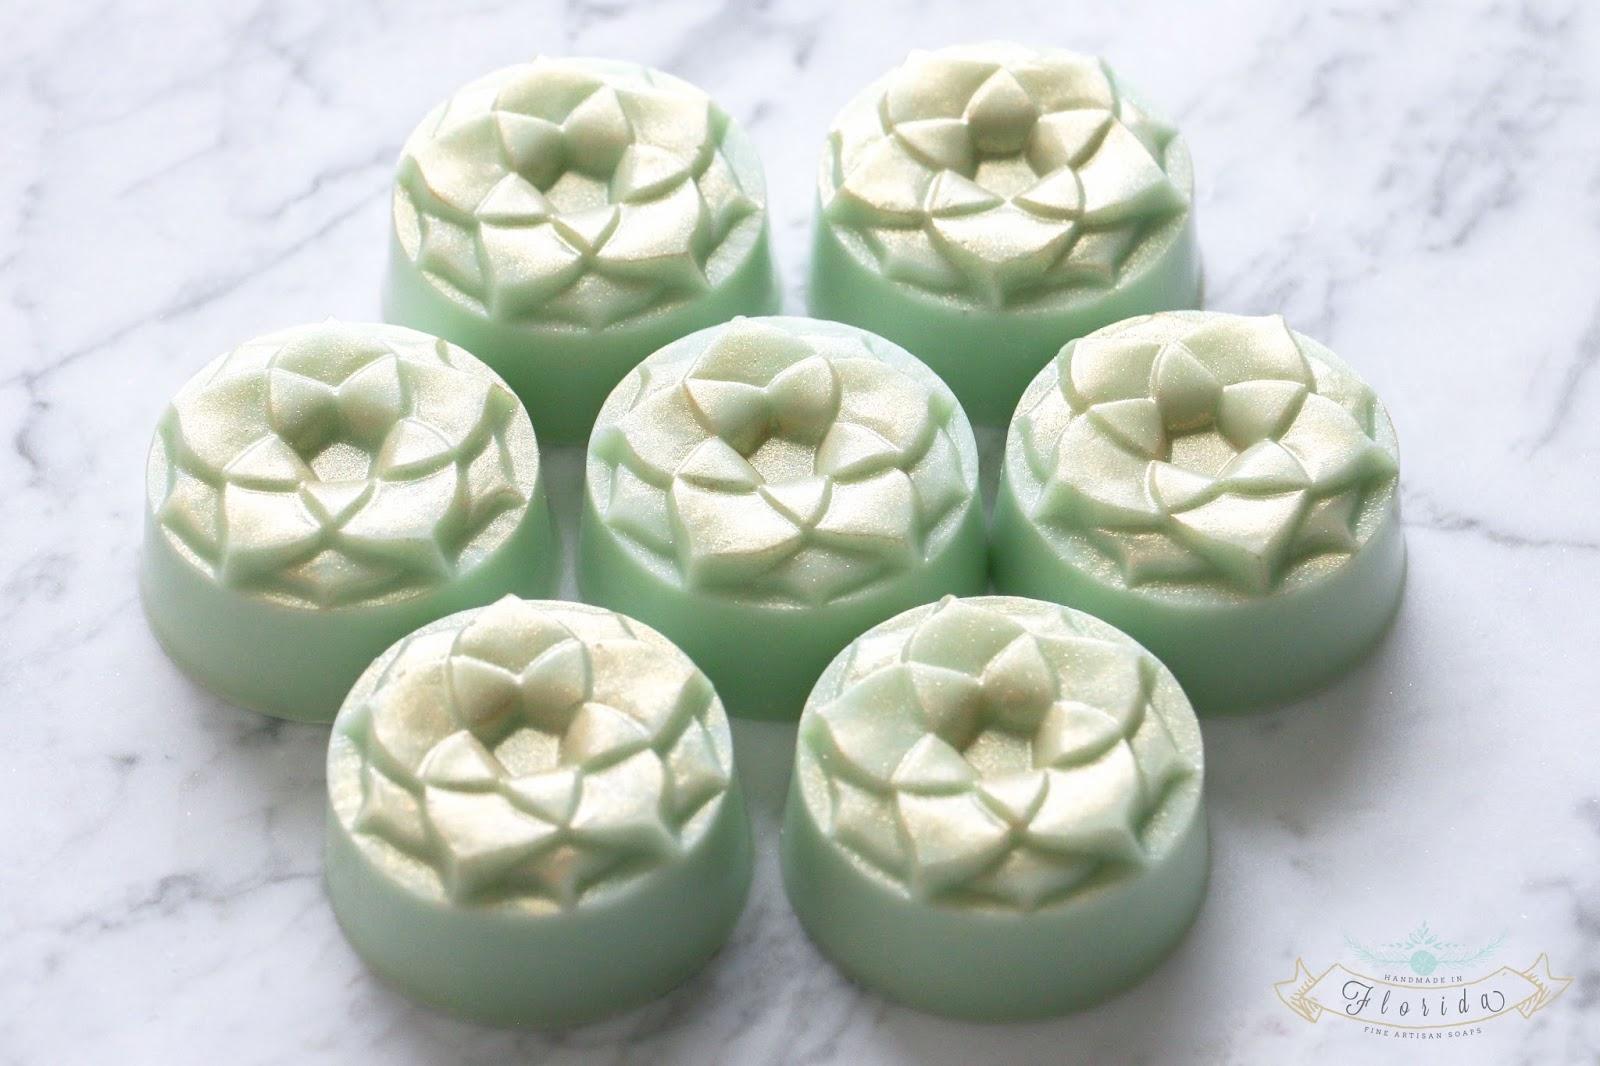 wax tarts melts Tarts flameless candles autumn wax melts tarts for warmer candle wax melts wax melts fall